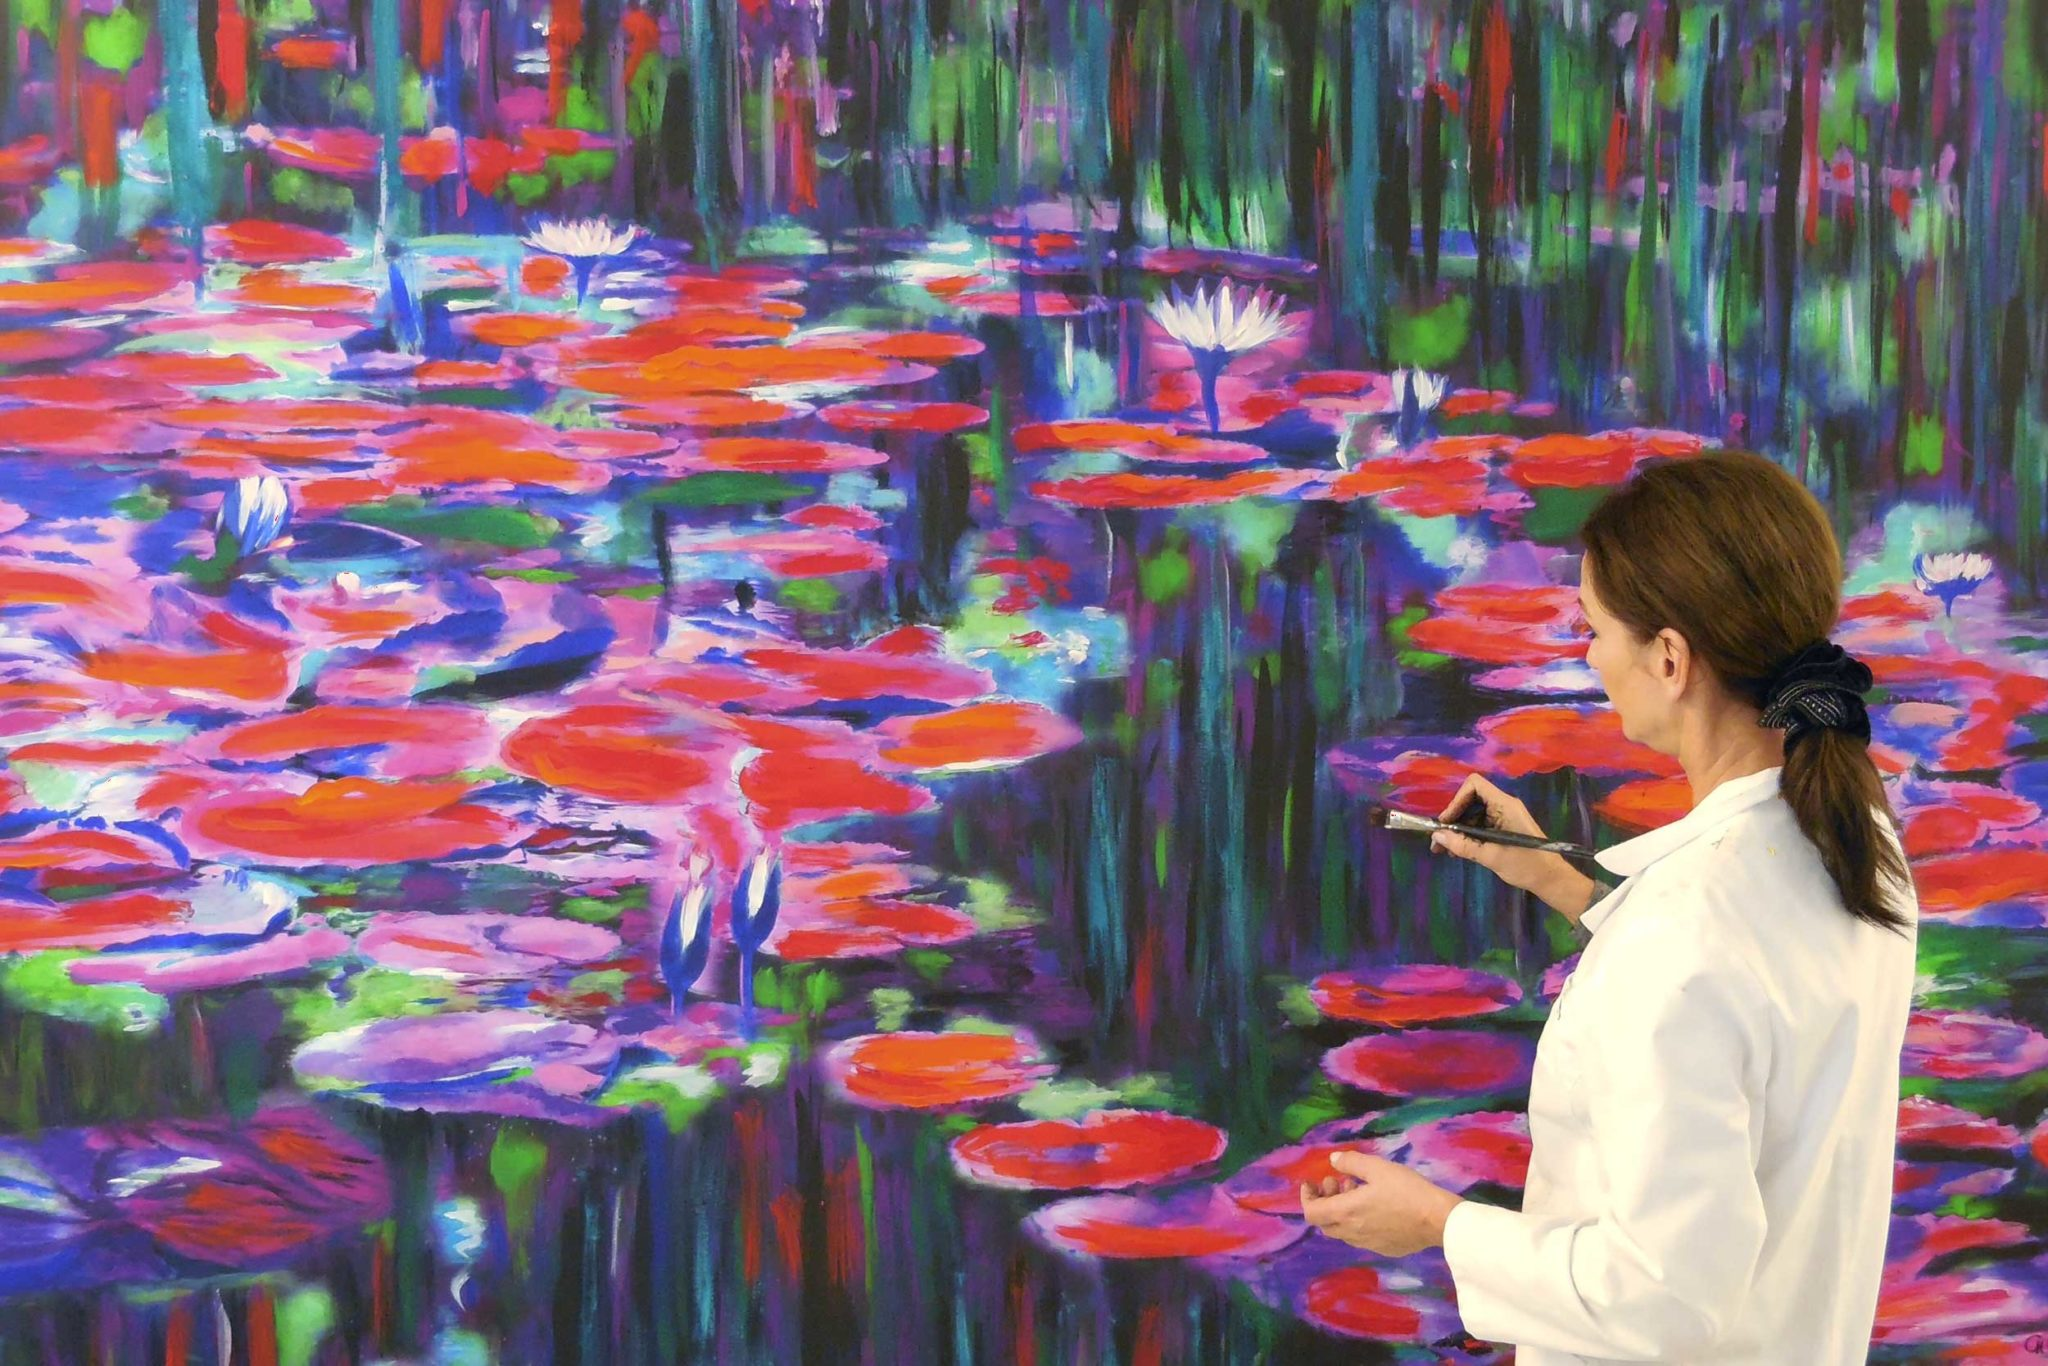 Cornelia Hagmann Painting Water Lilies Pond Red Green Purple Blue, Seidenschal, sciarpa di seta, foulard soie,